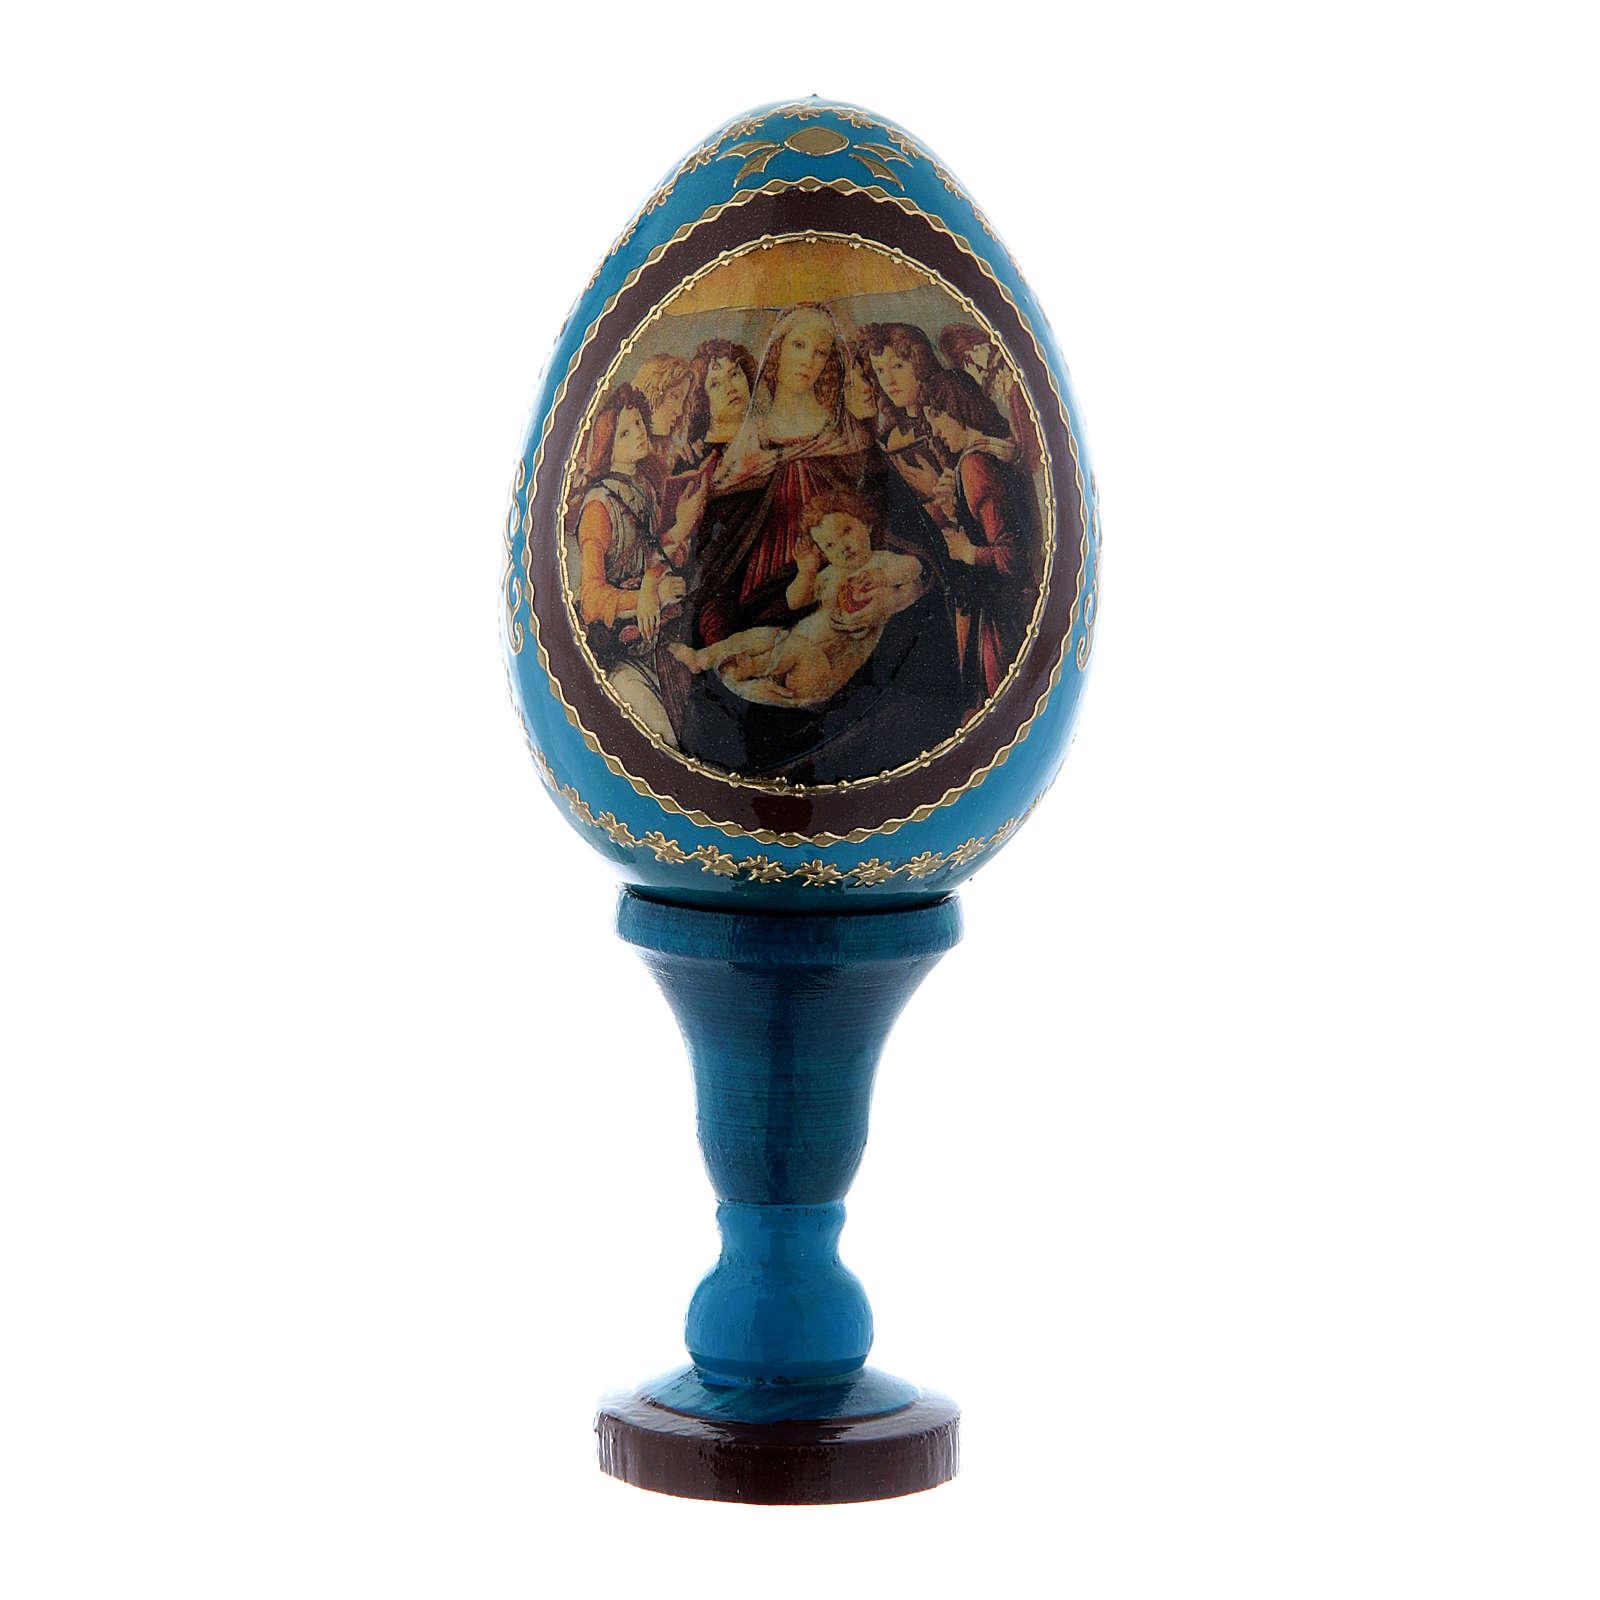 Huevo de madera ruso azul h tot 13 cm La Virgen de la granada 4